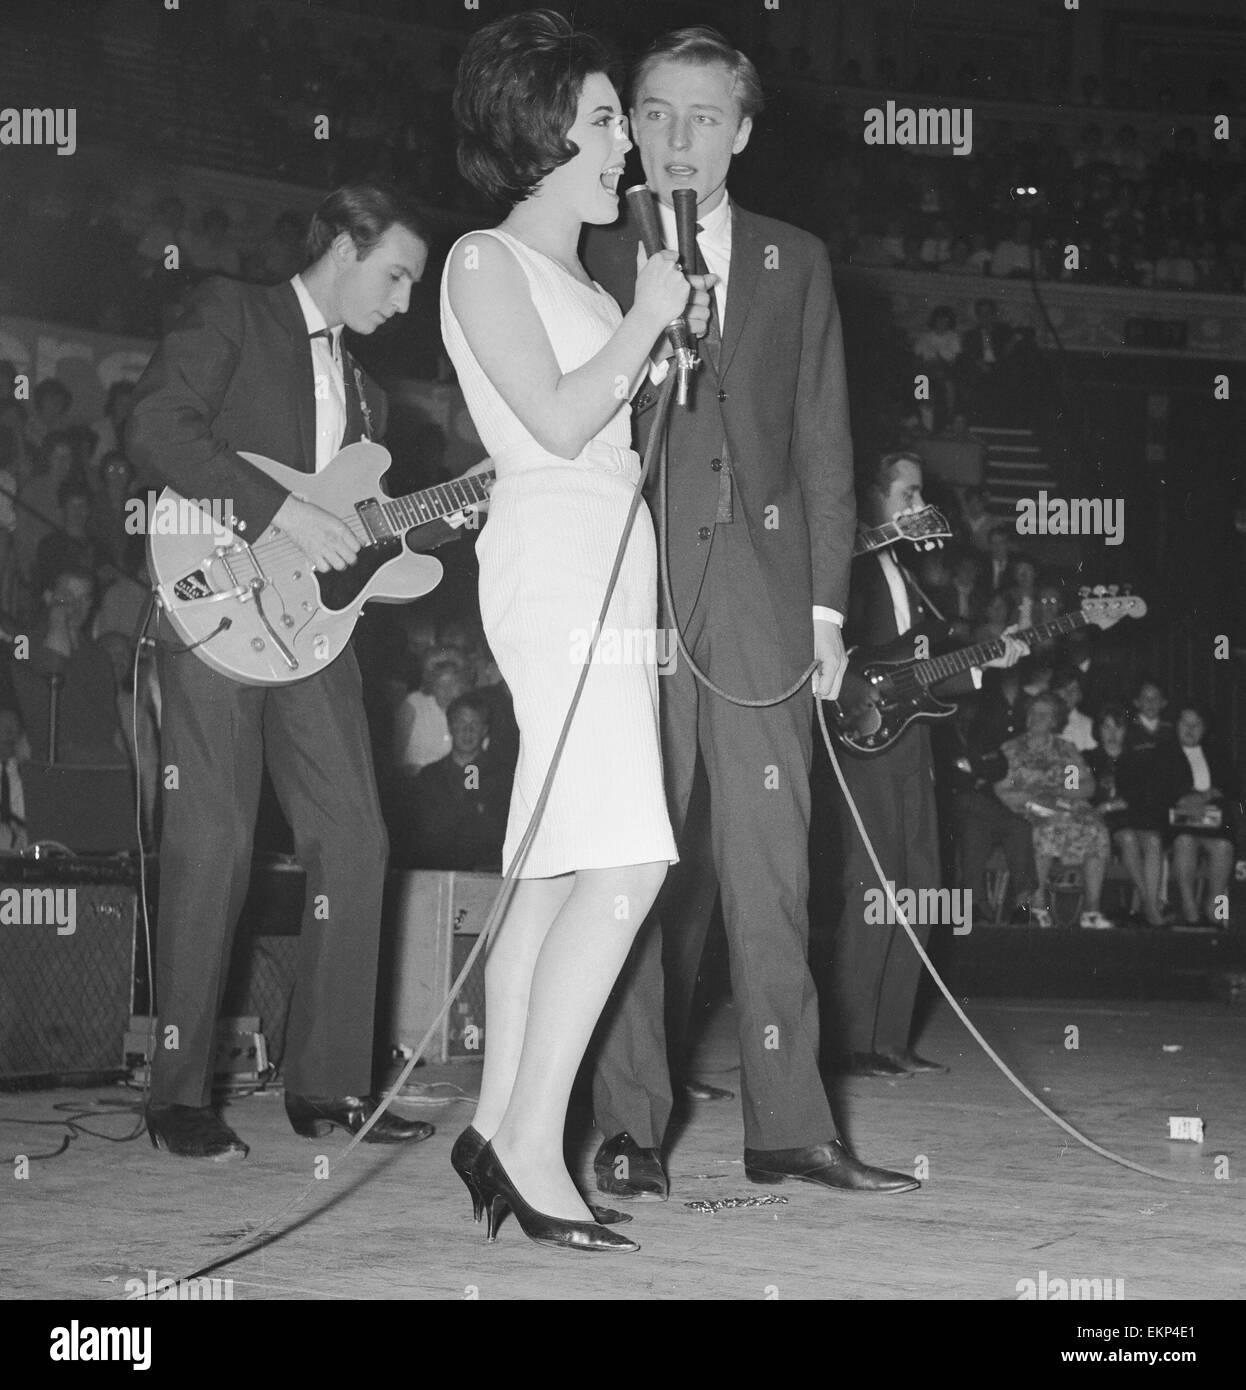 british pop singer mike sarne performing on stage at the pop prom british pop singer mike sarne performing on stage at the pop prom at the royal albert hall partner billie davis 16th 1962